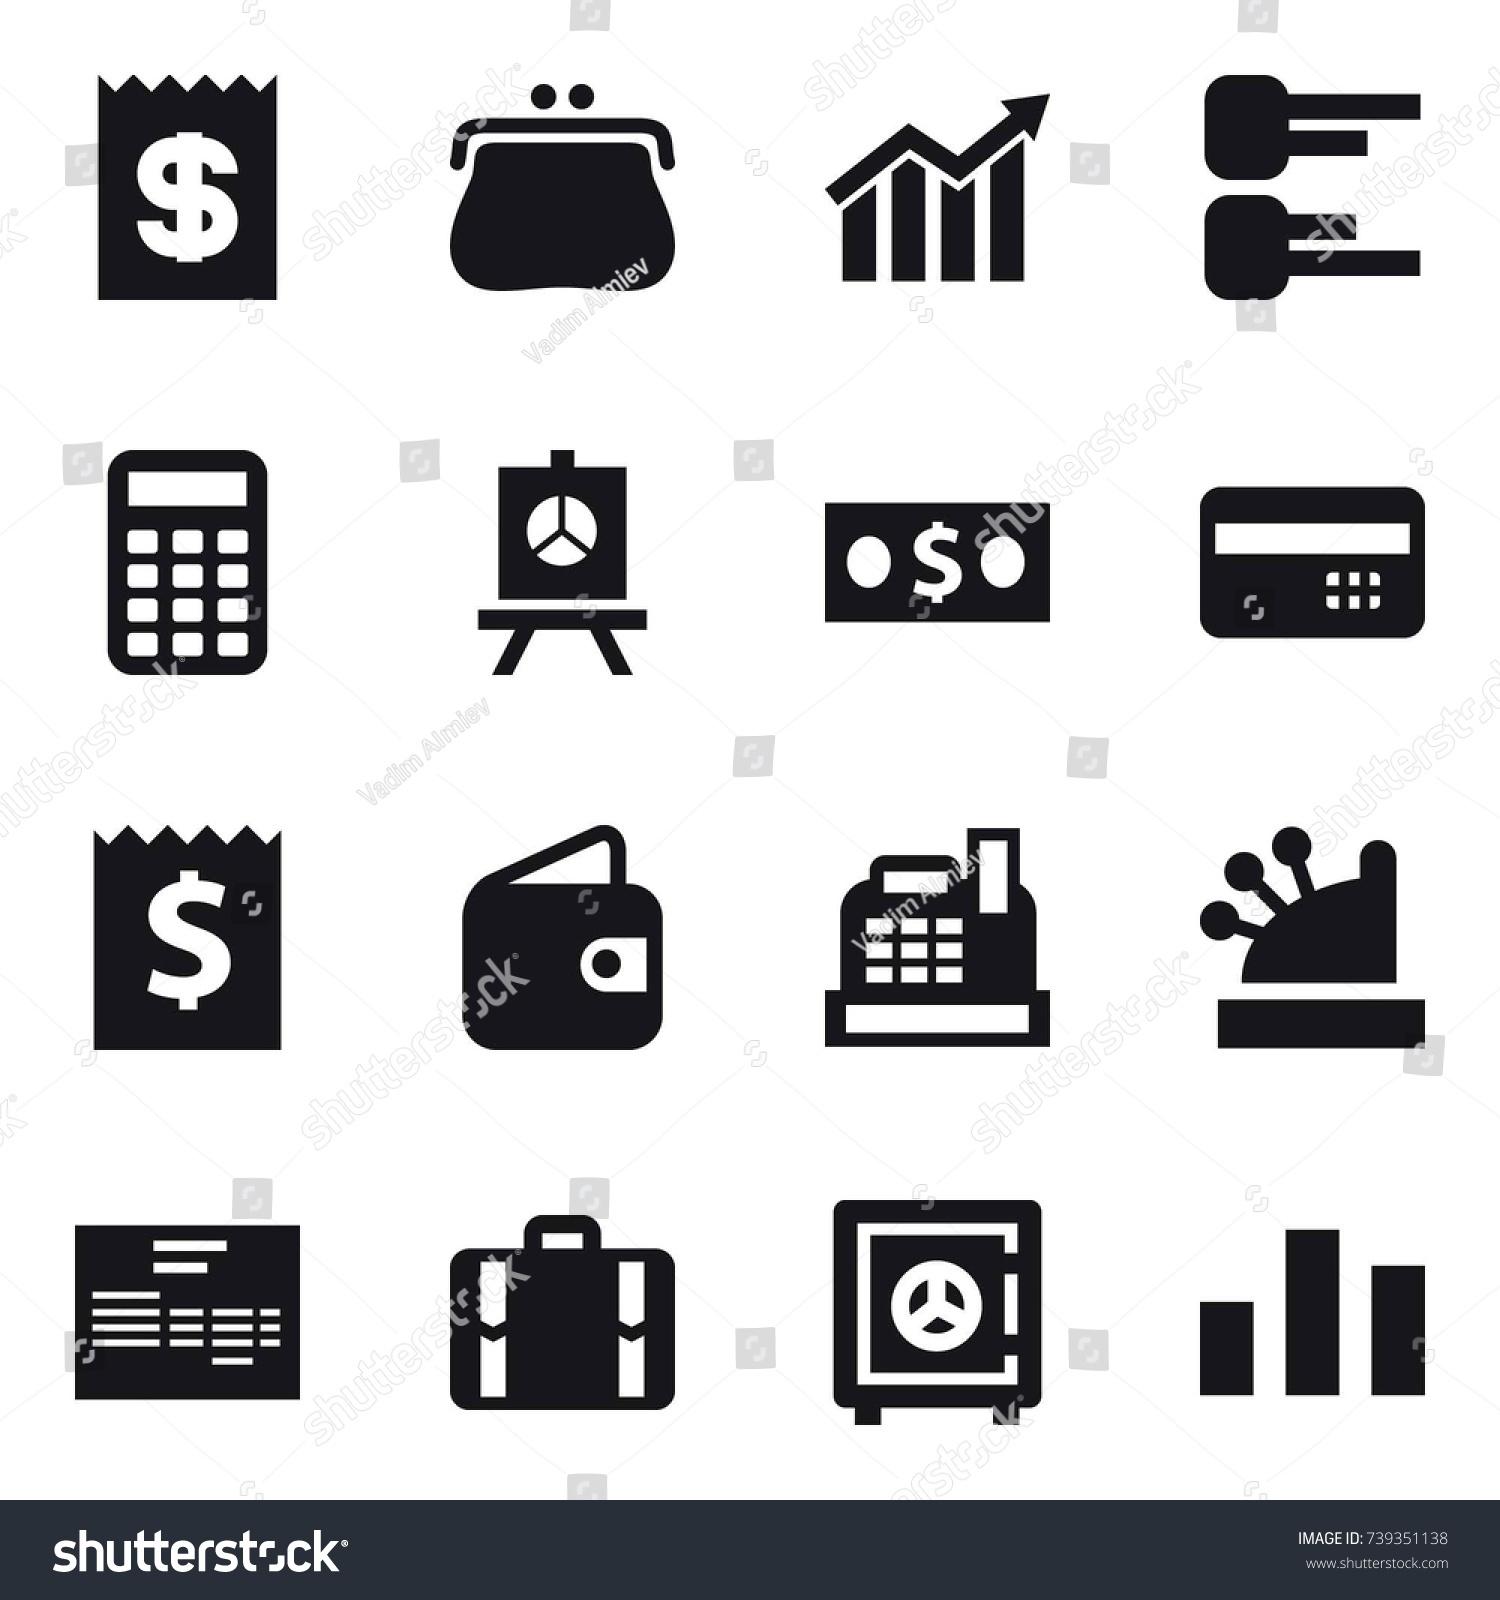 hight resolution of 16 vector icon set receipt purse diagram calculator presentation money